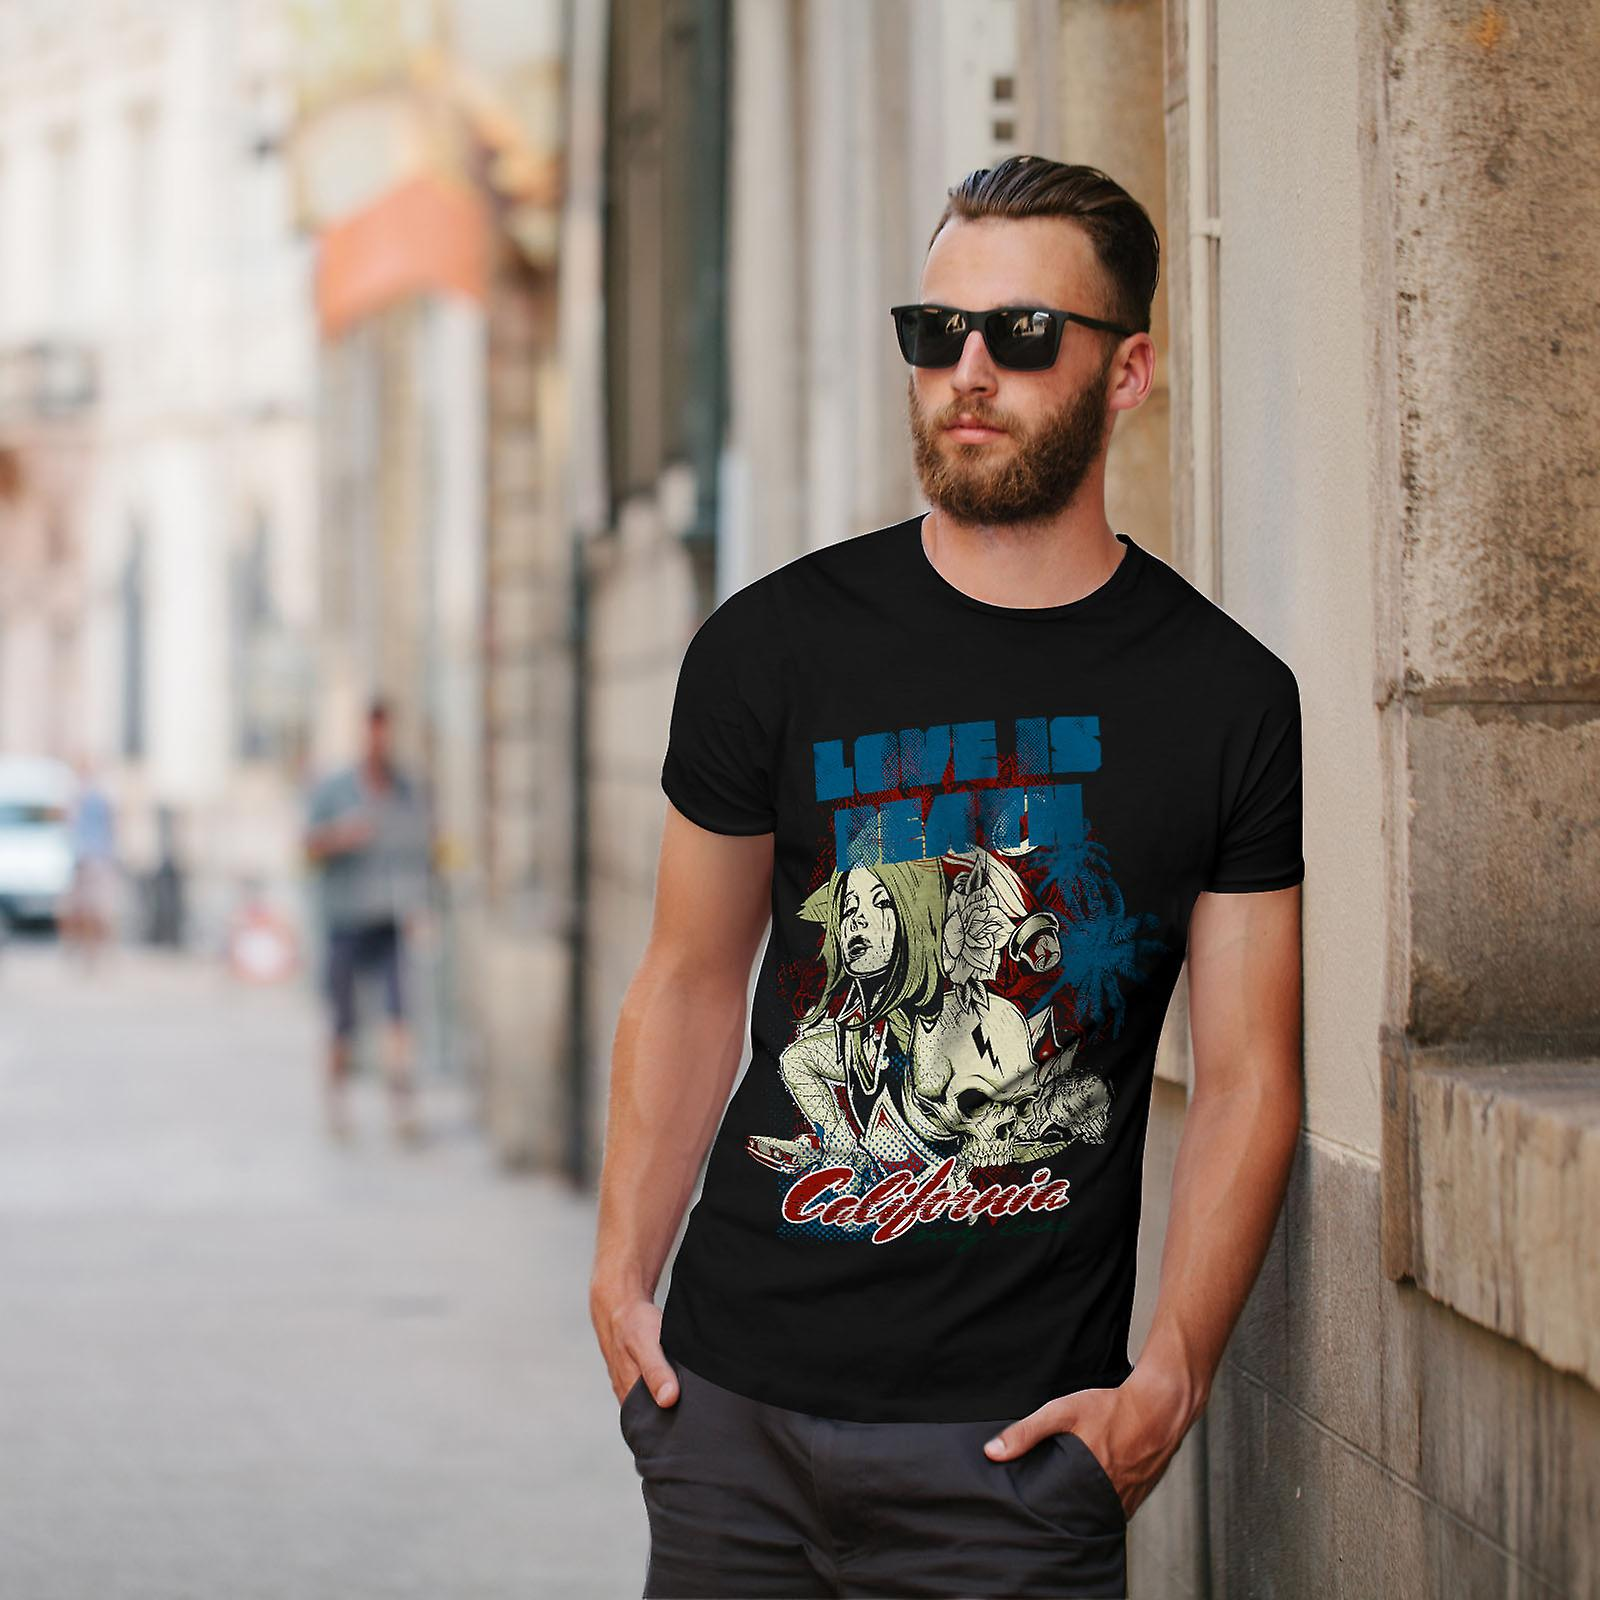 El amor es muerte California hombres negro camiseta | Wellcoda